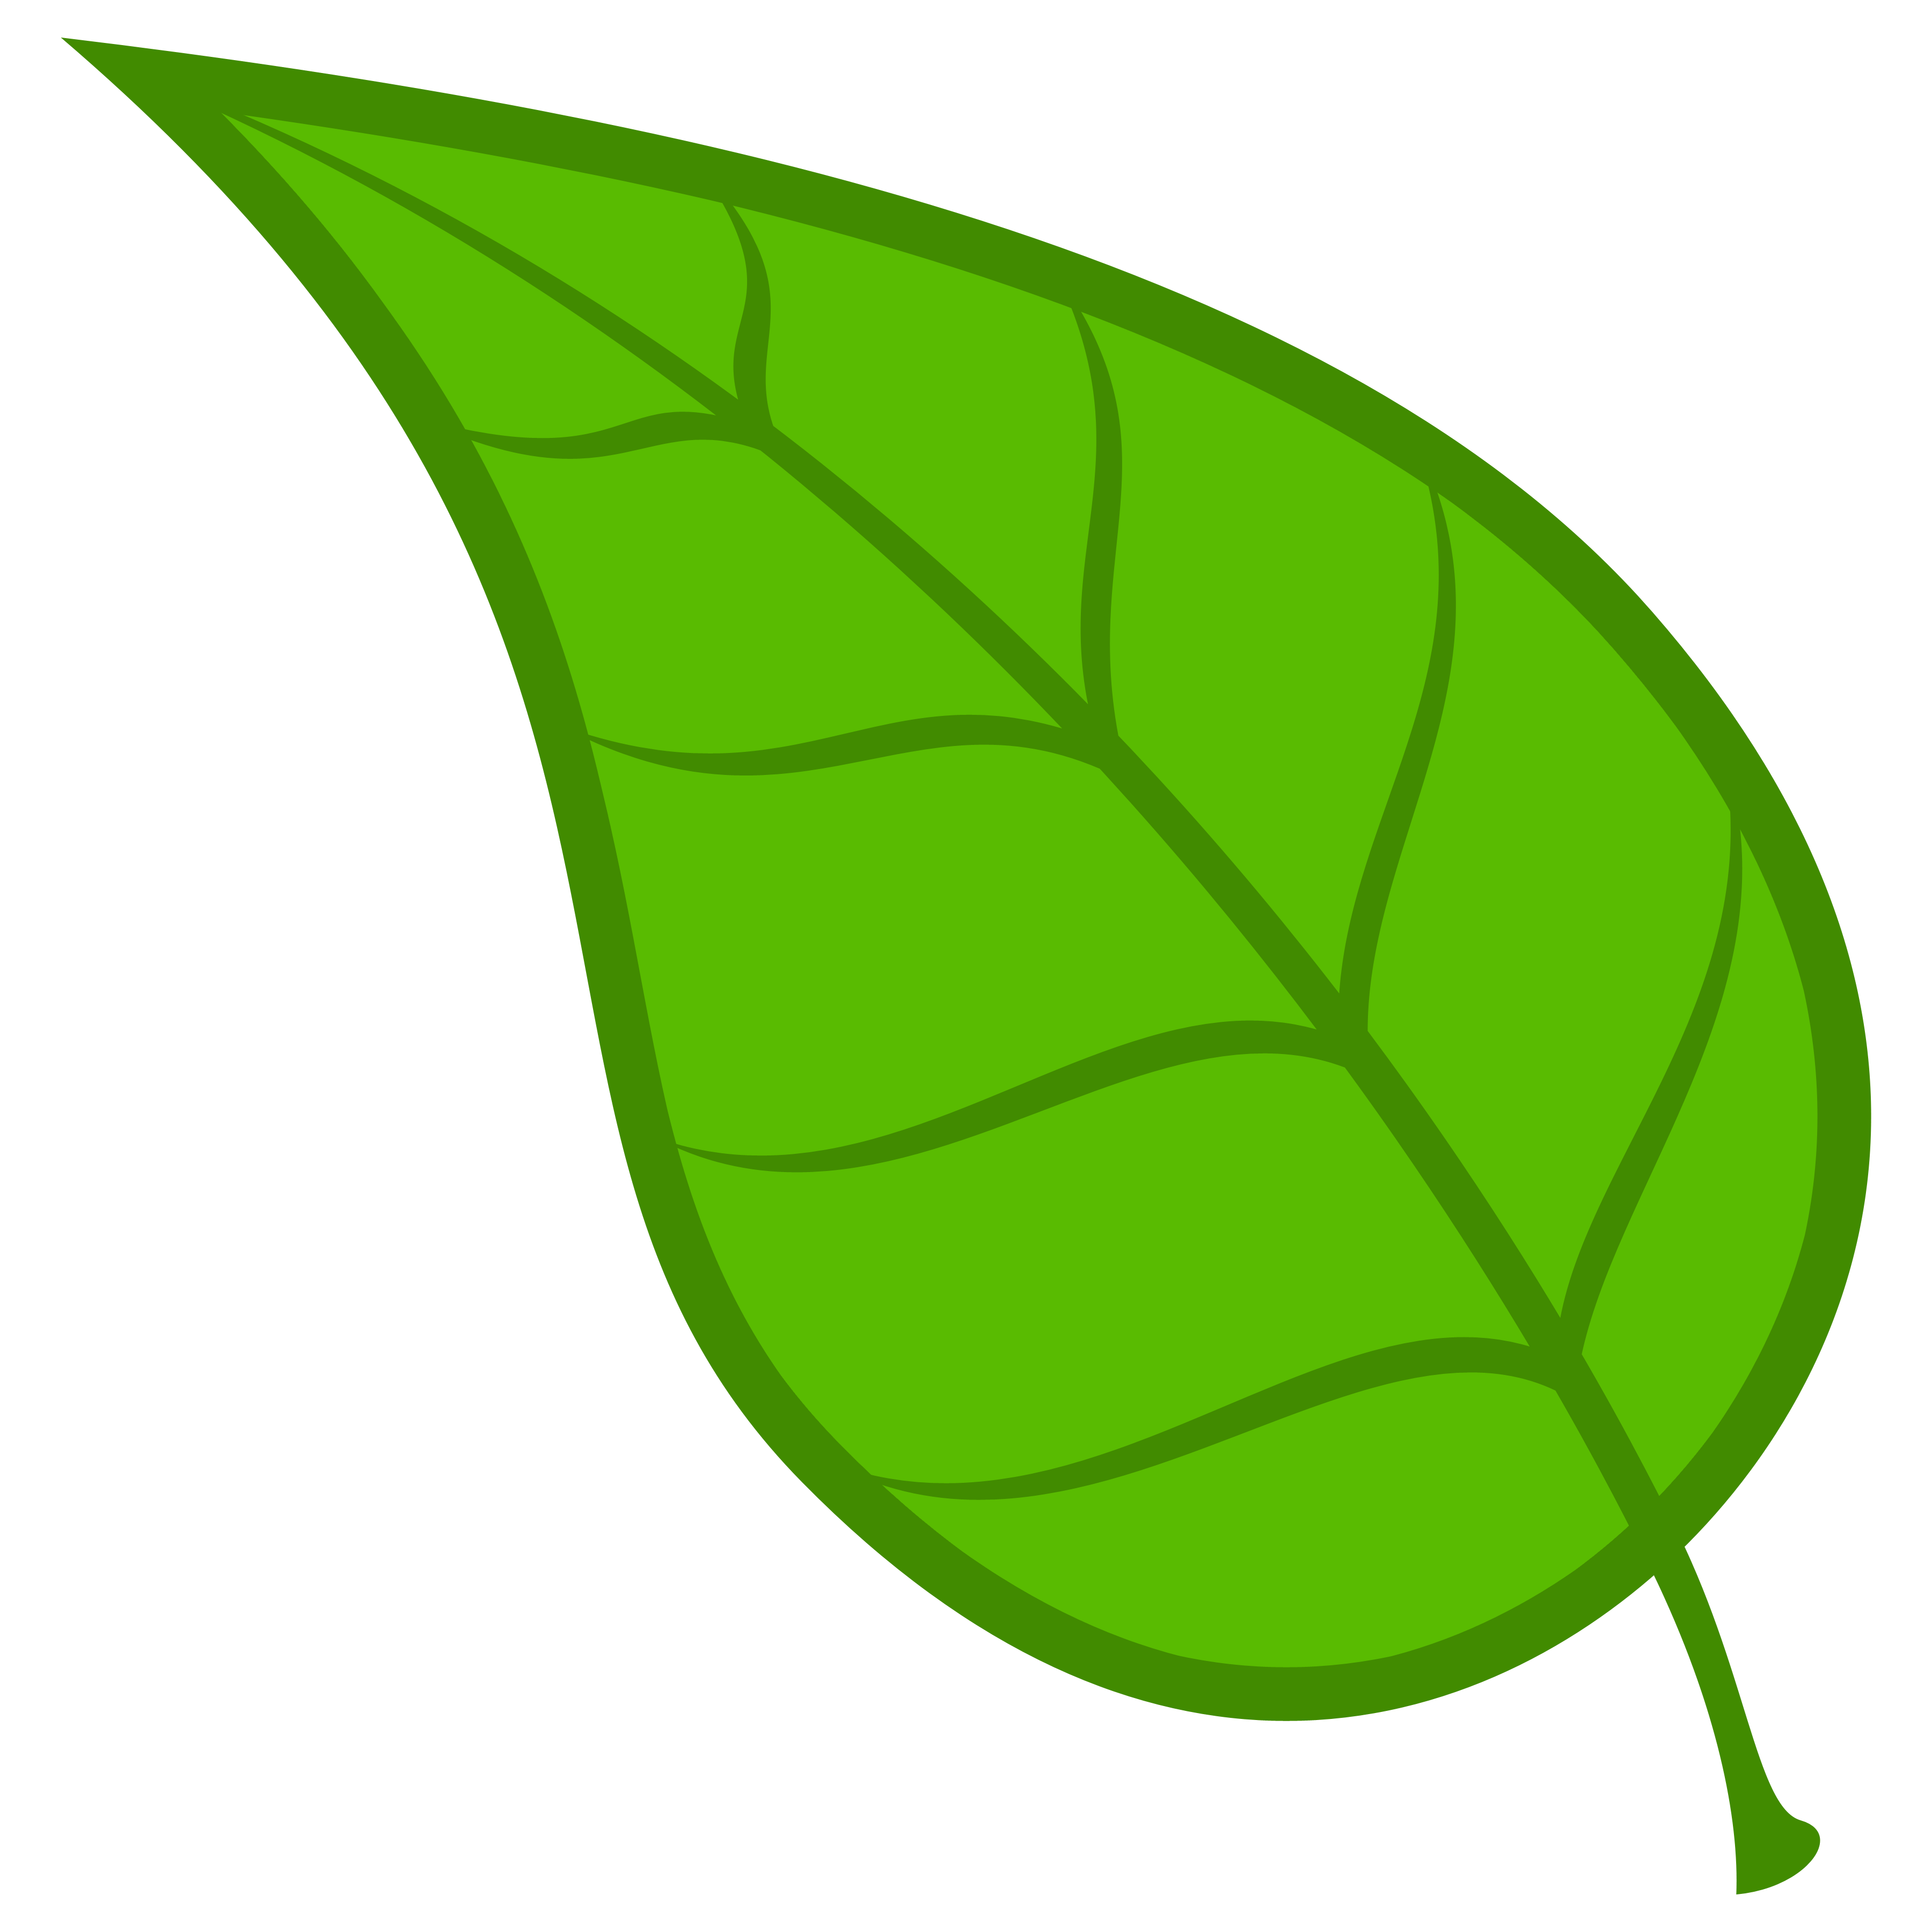 3600x3600 Leaves Clipart Green Leaf